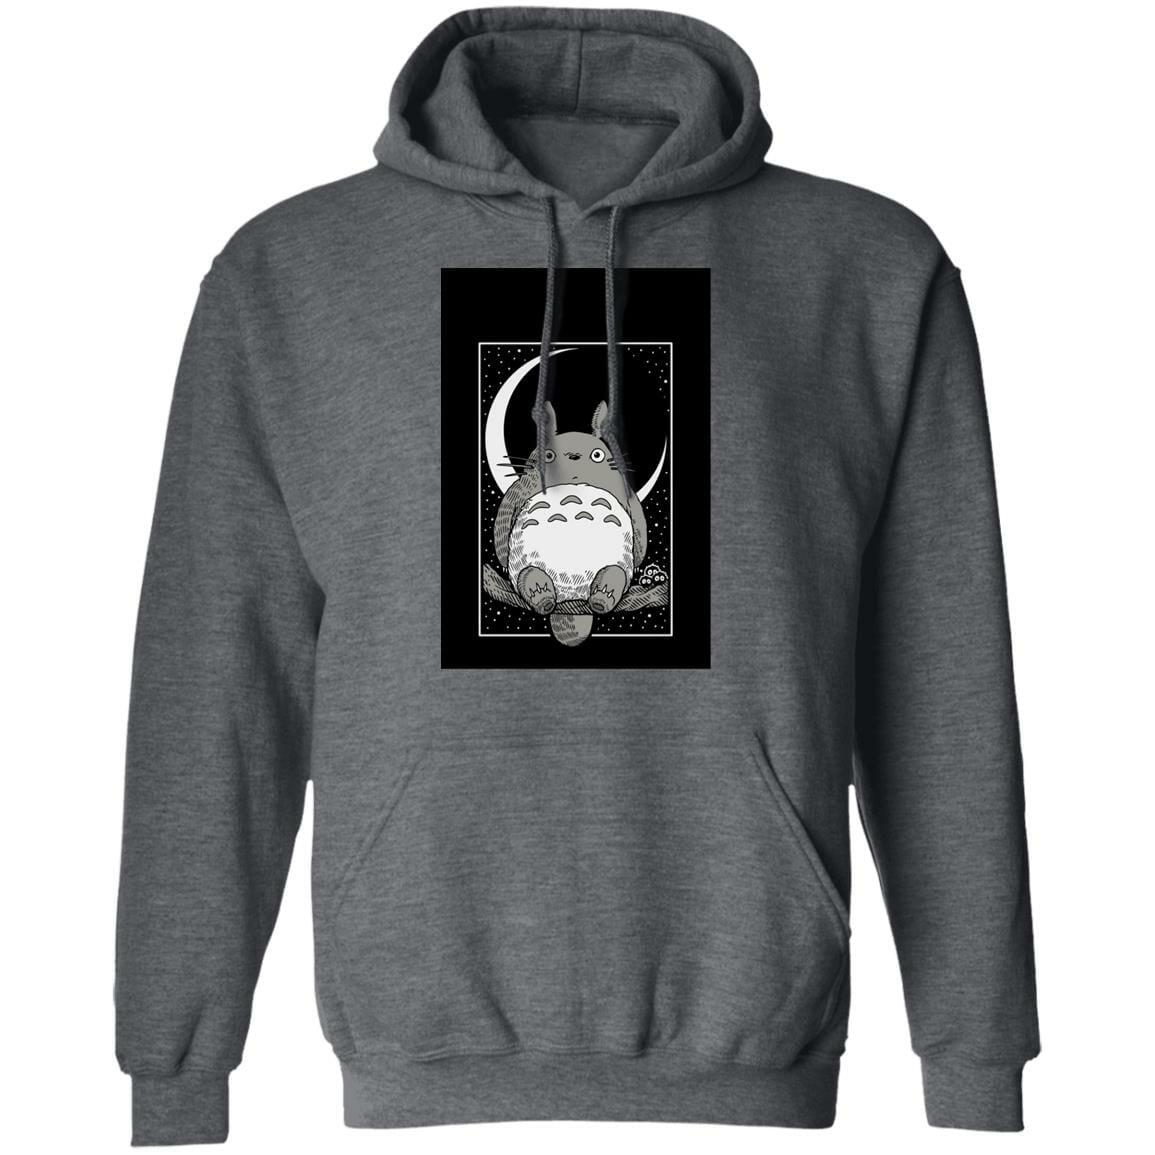 My Neighbor Totoro by the Moon Black & White Hoodie Unisex